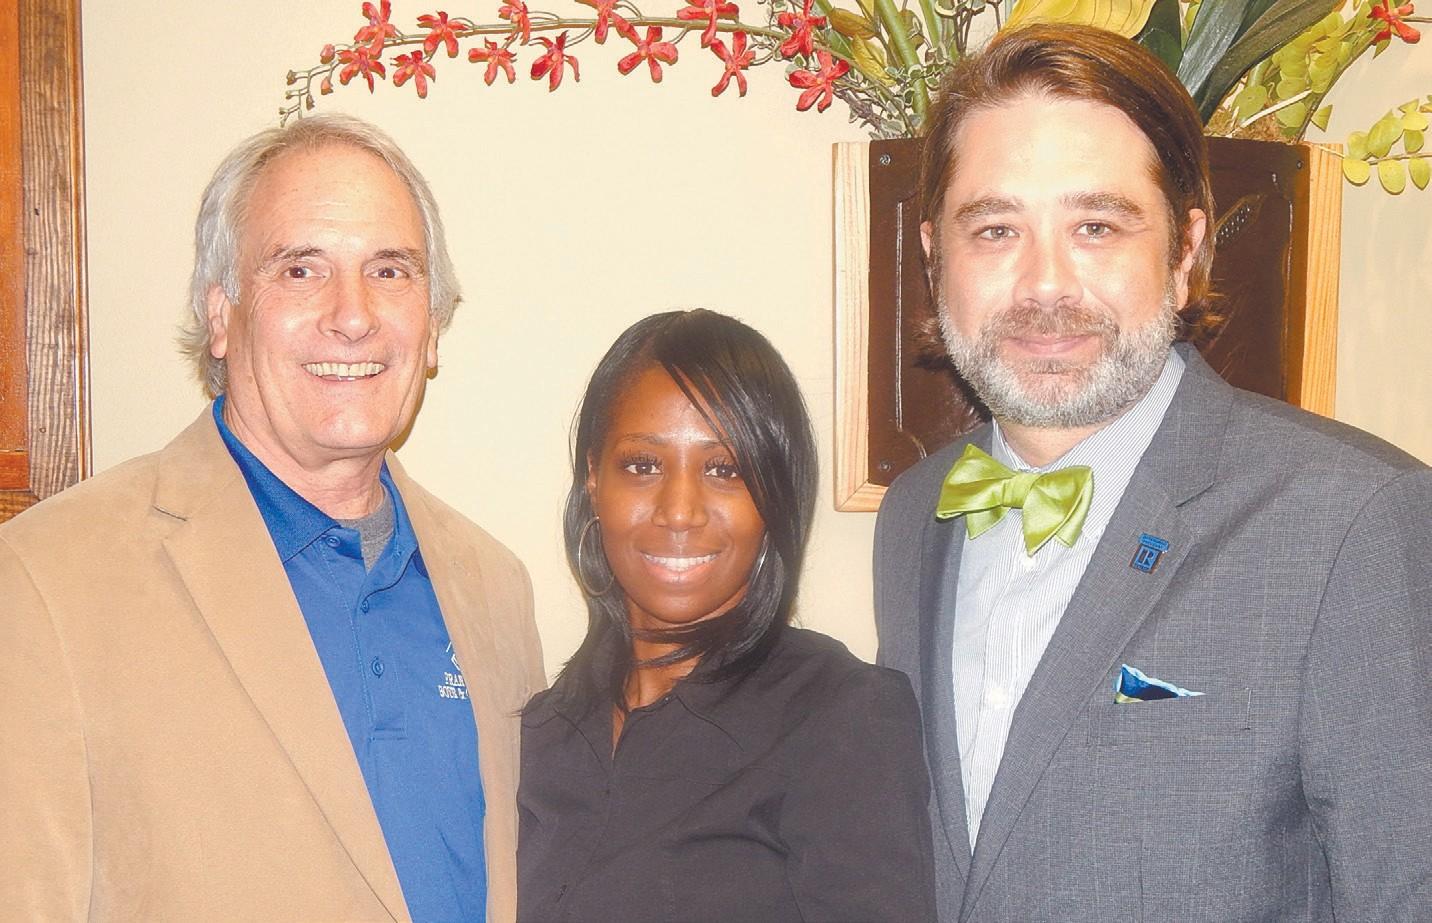 Vince Delmonte, Karen Hamilton and Trey Nivers